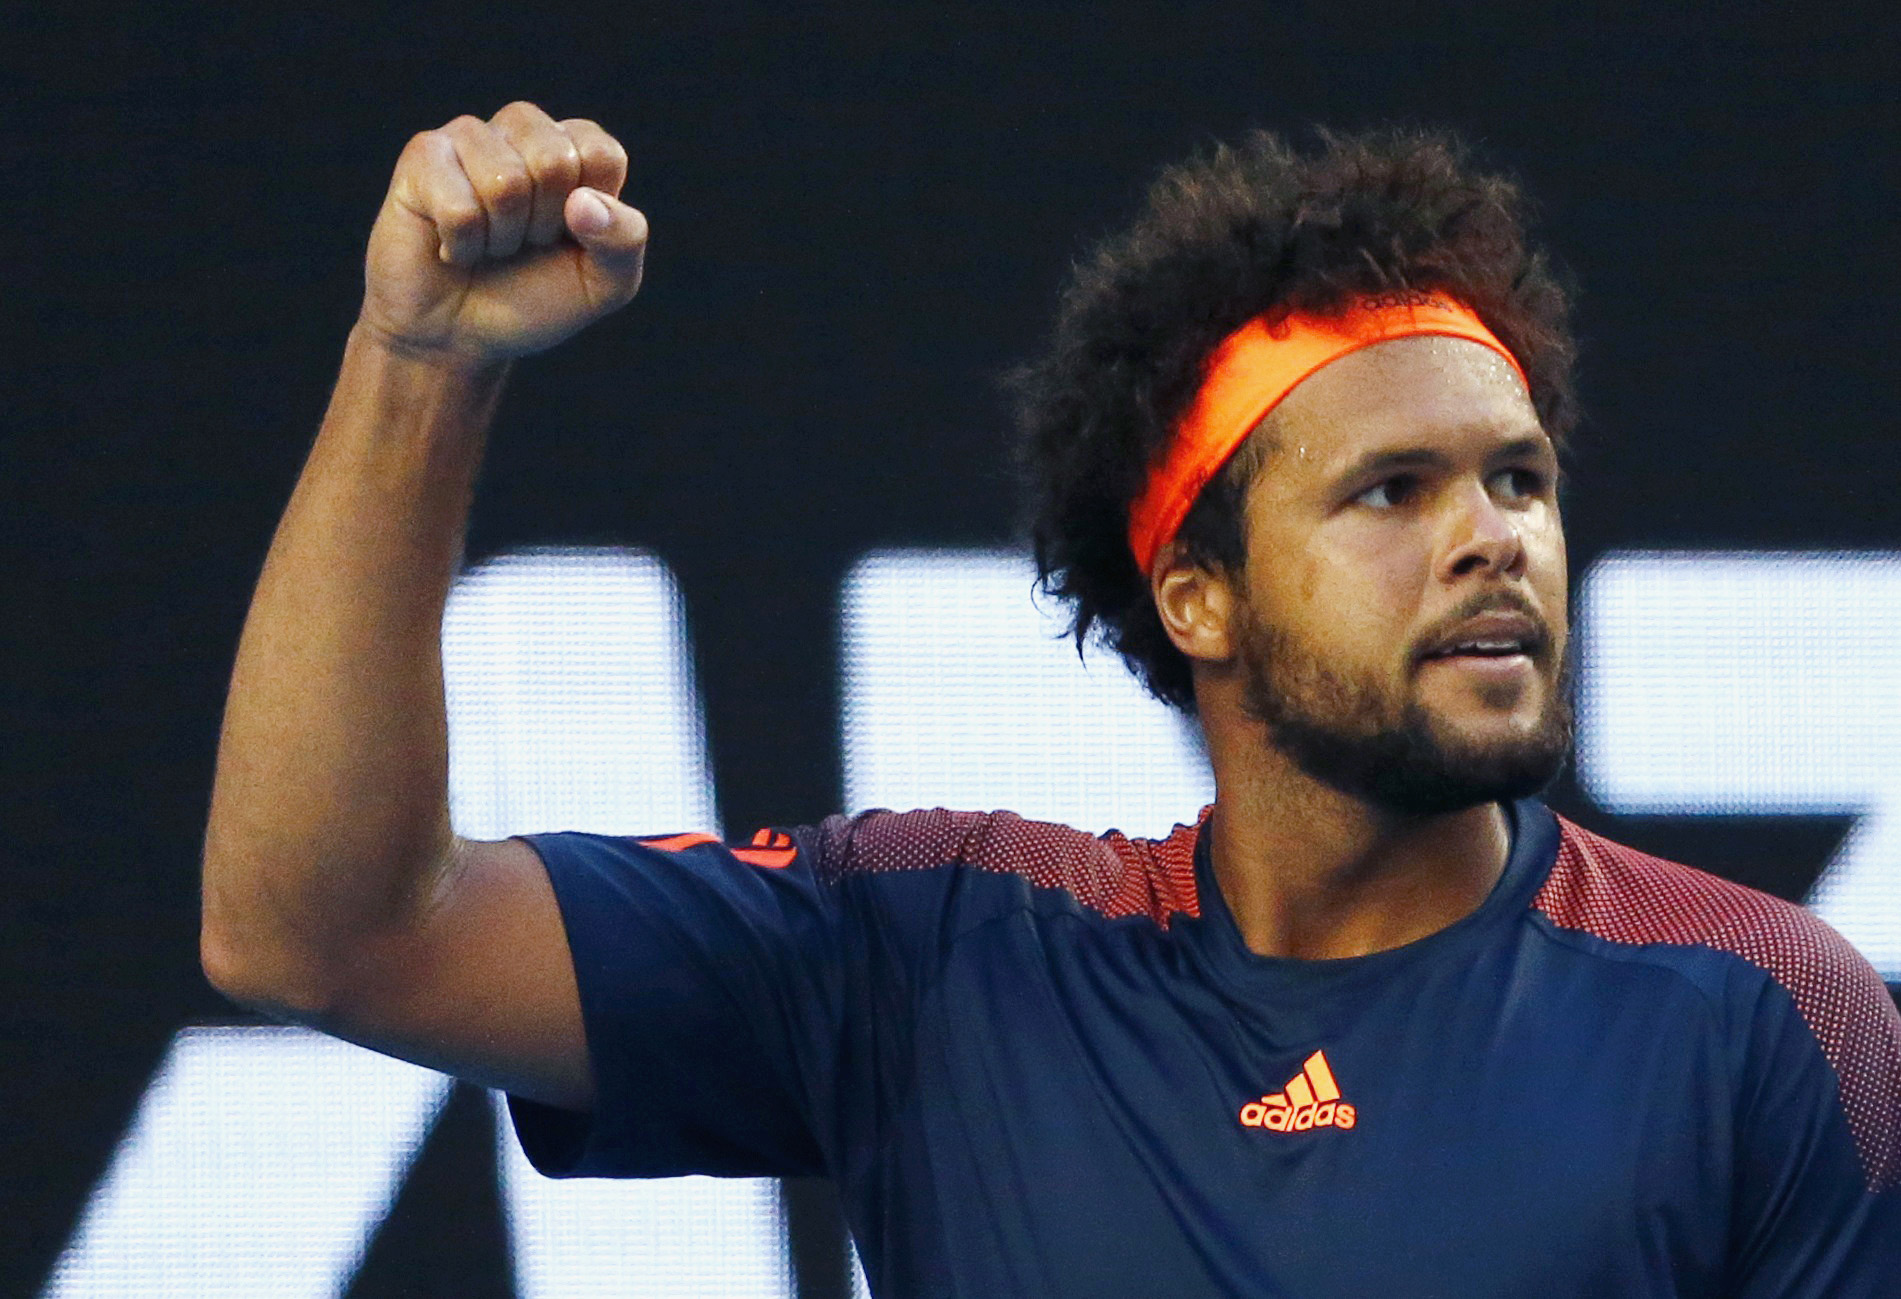 Tennis : Open Australie - Tsonga a fait respecter son rang et retrouvera Wawrinka en quart de finale